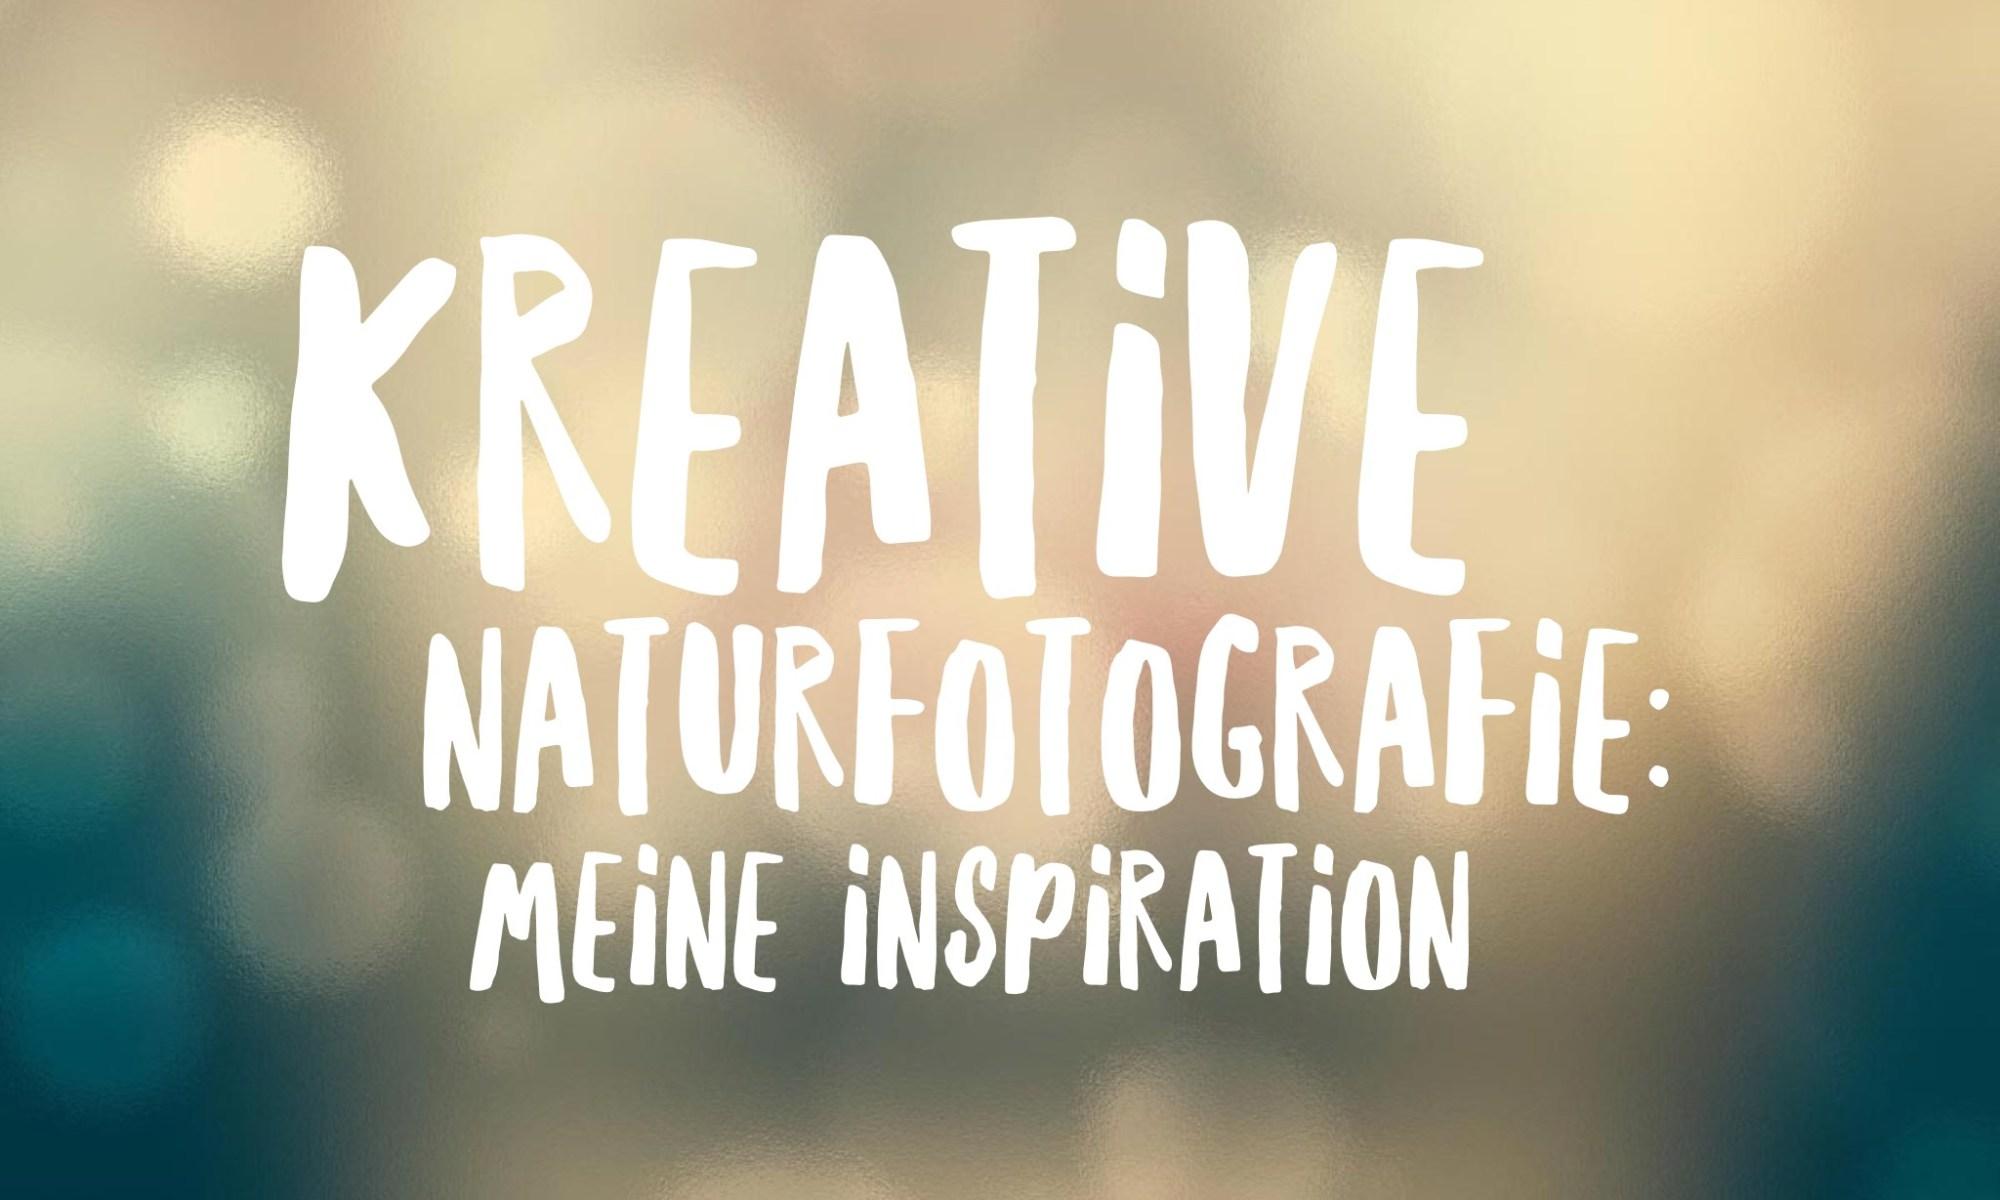 kreative-naturfotografie-inspirations-tipps